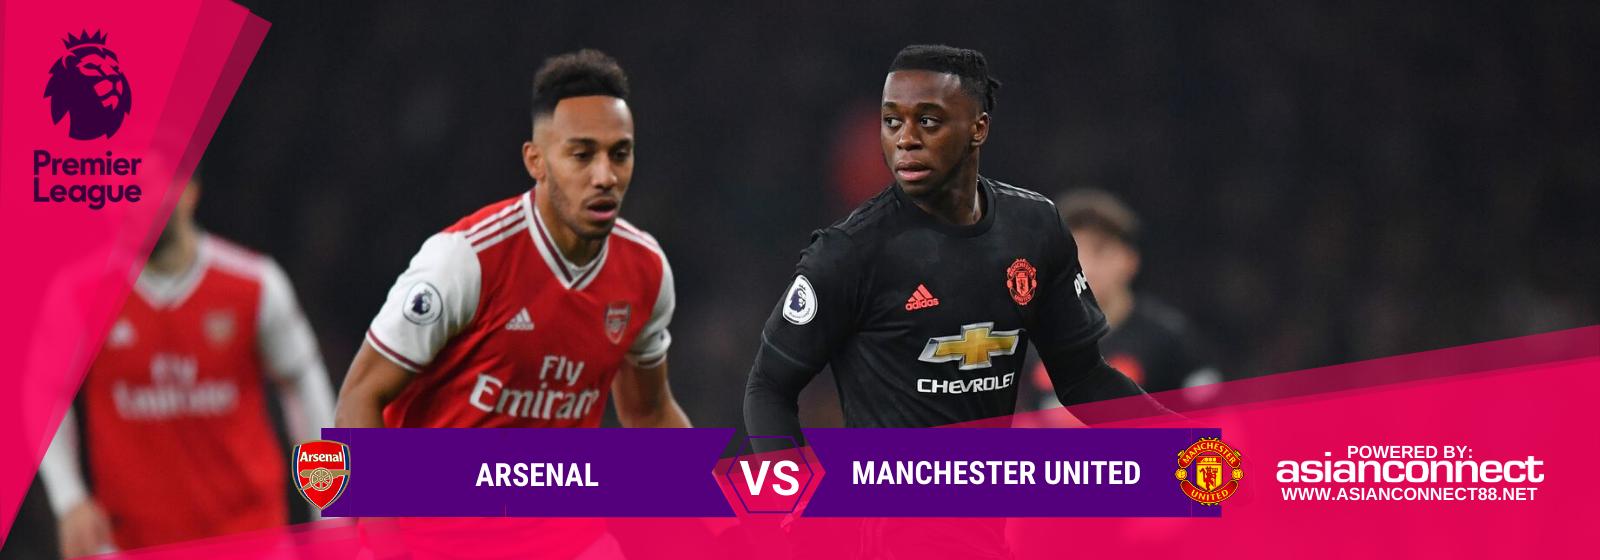 Asianconnect: Arsenal vs Manchester United